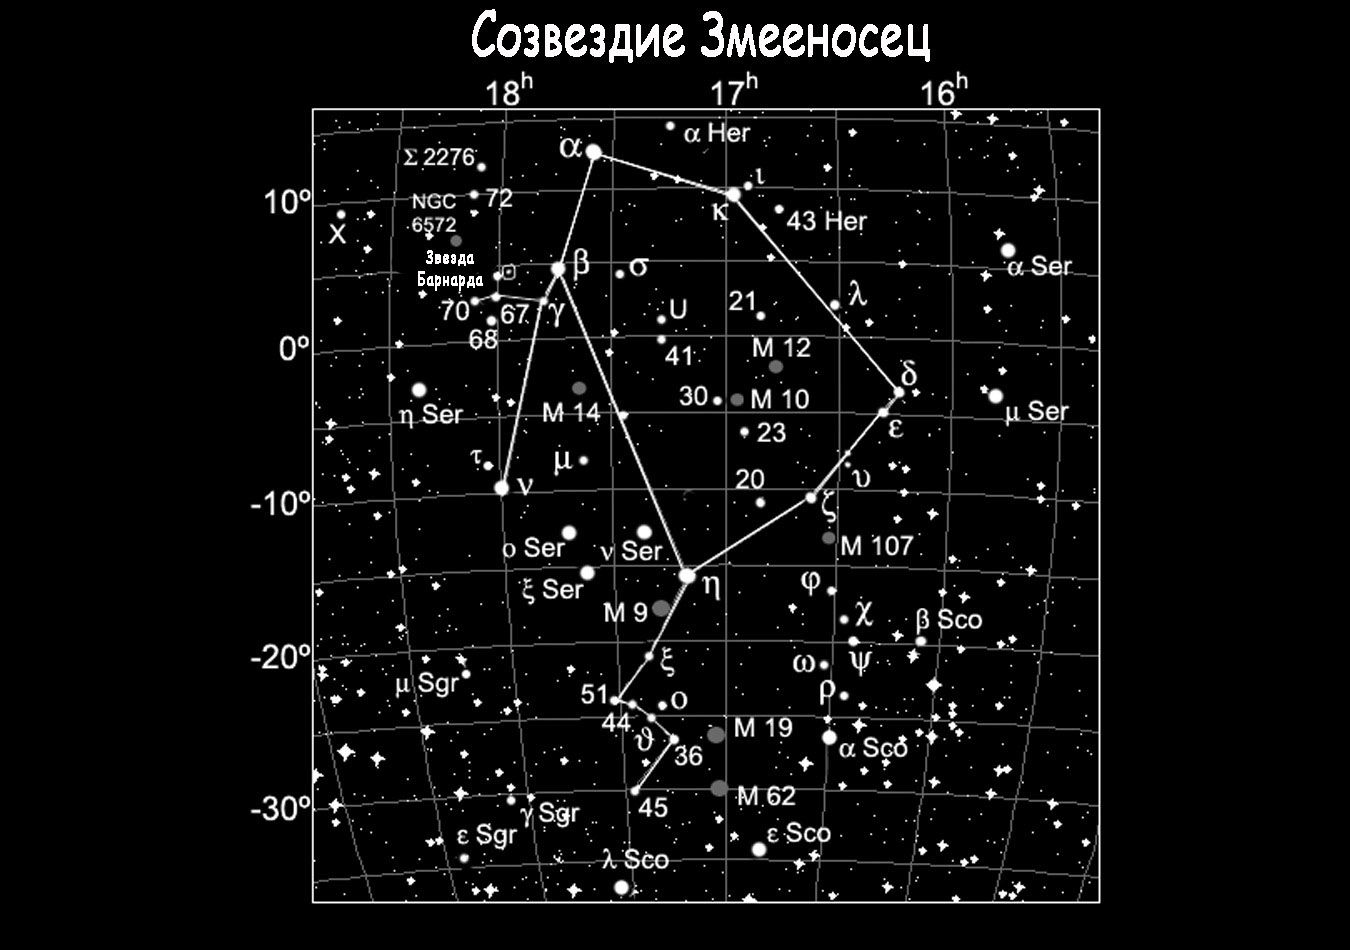 Созвездие Змееносец - тайный знак Зодиака: характеристика ...